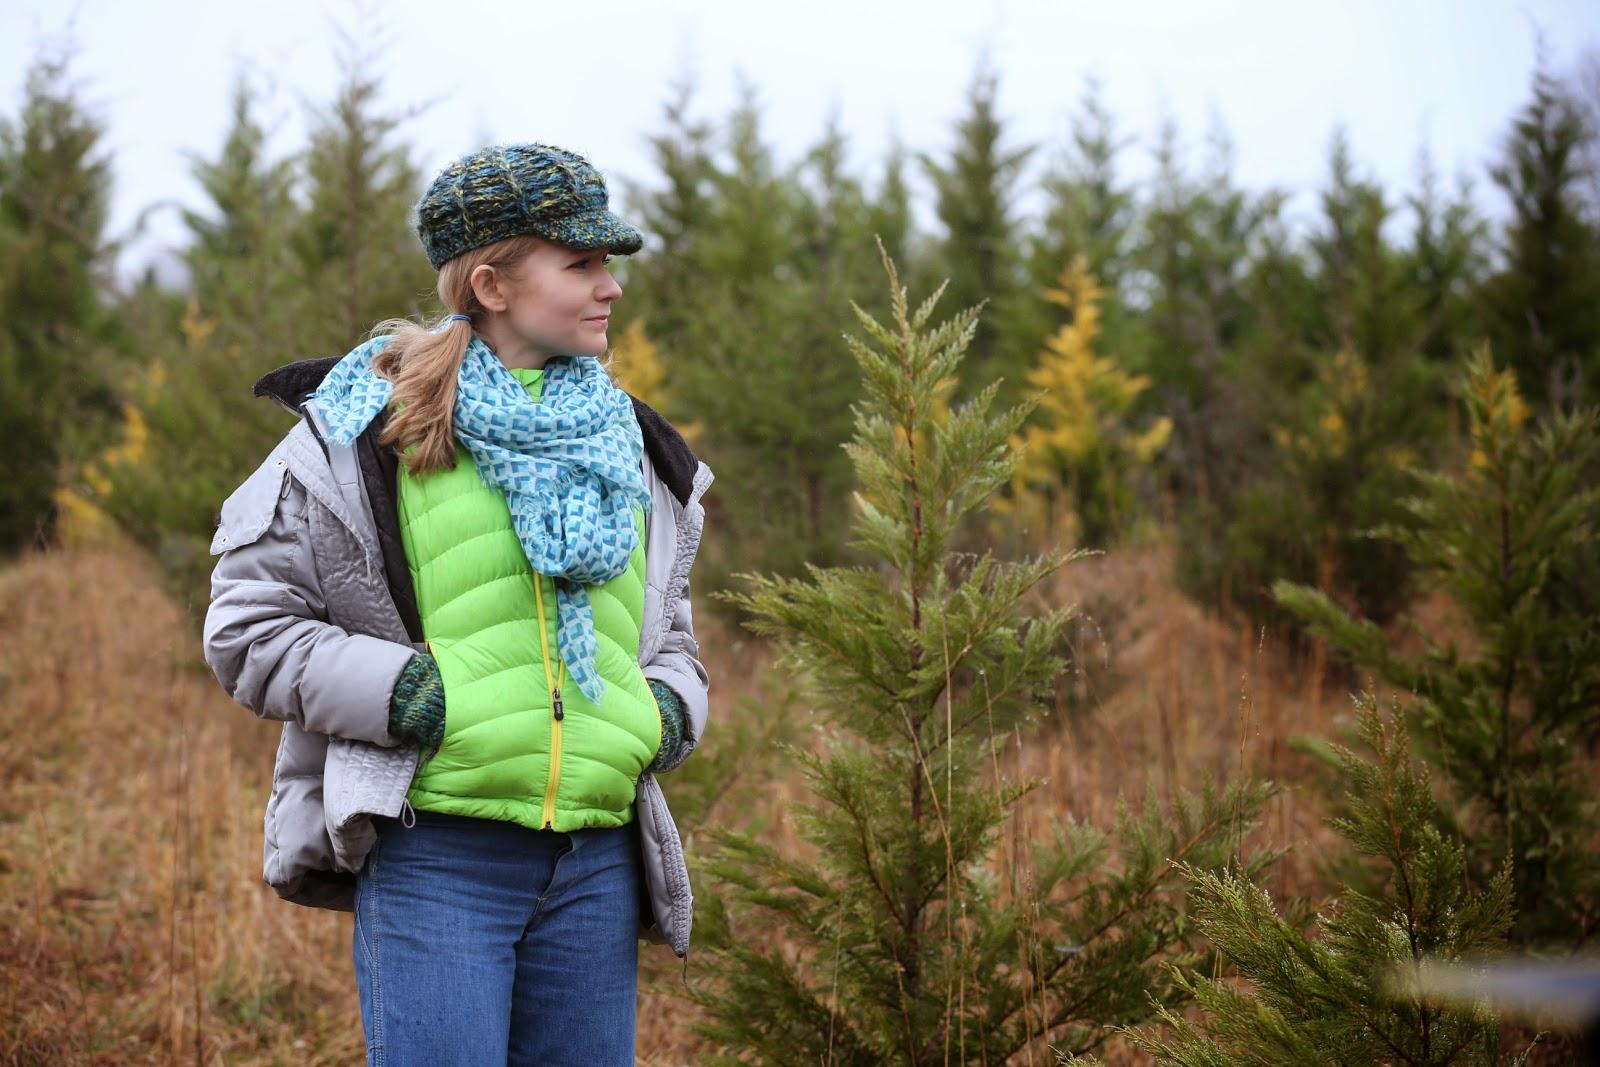 charleene closshey as evie lee - An Evergreen Christmas